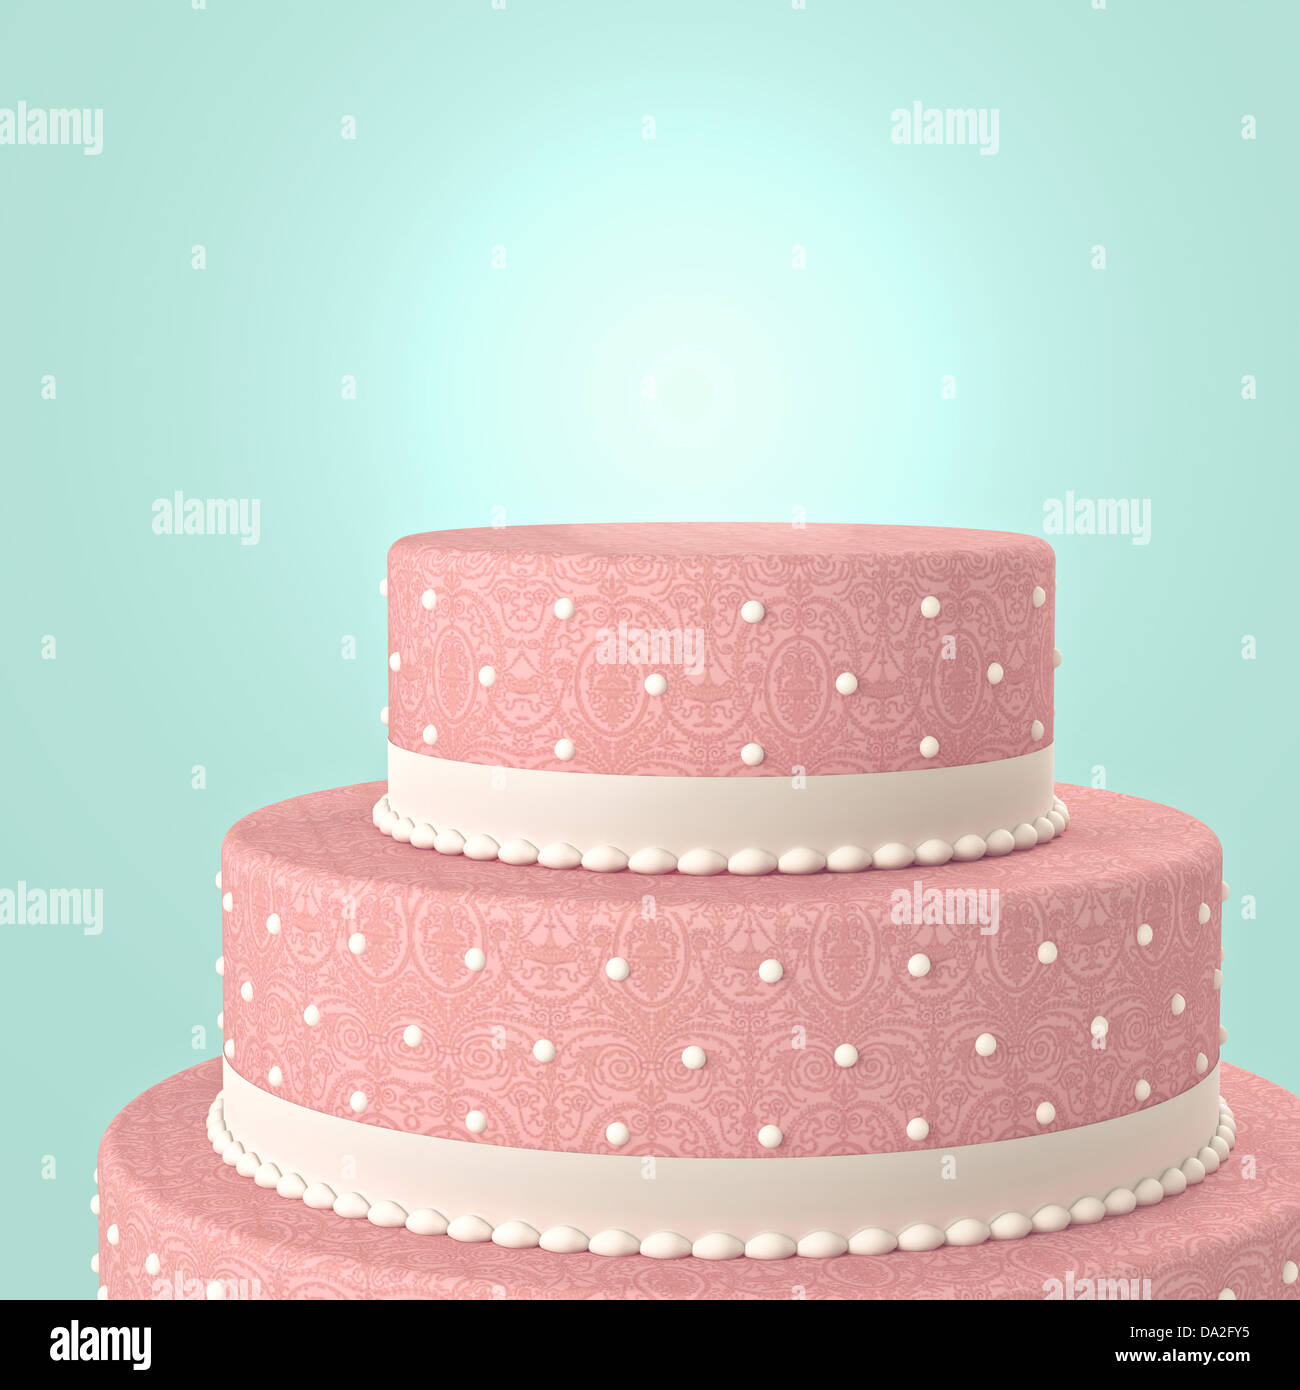 Classic Wedding Cake Groom Bride Stock Photos & Classic Wedding Cake ...